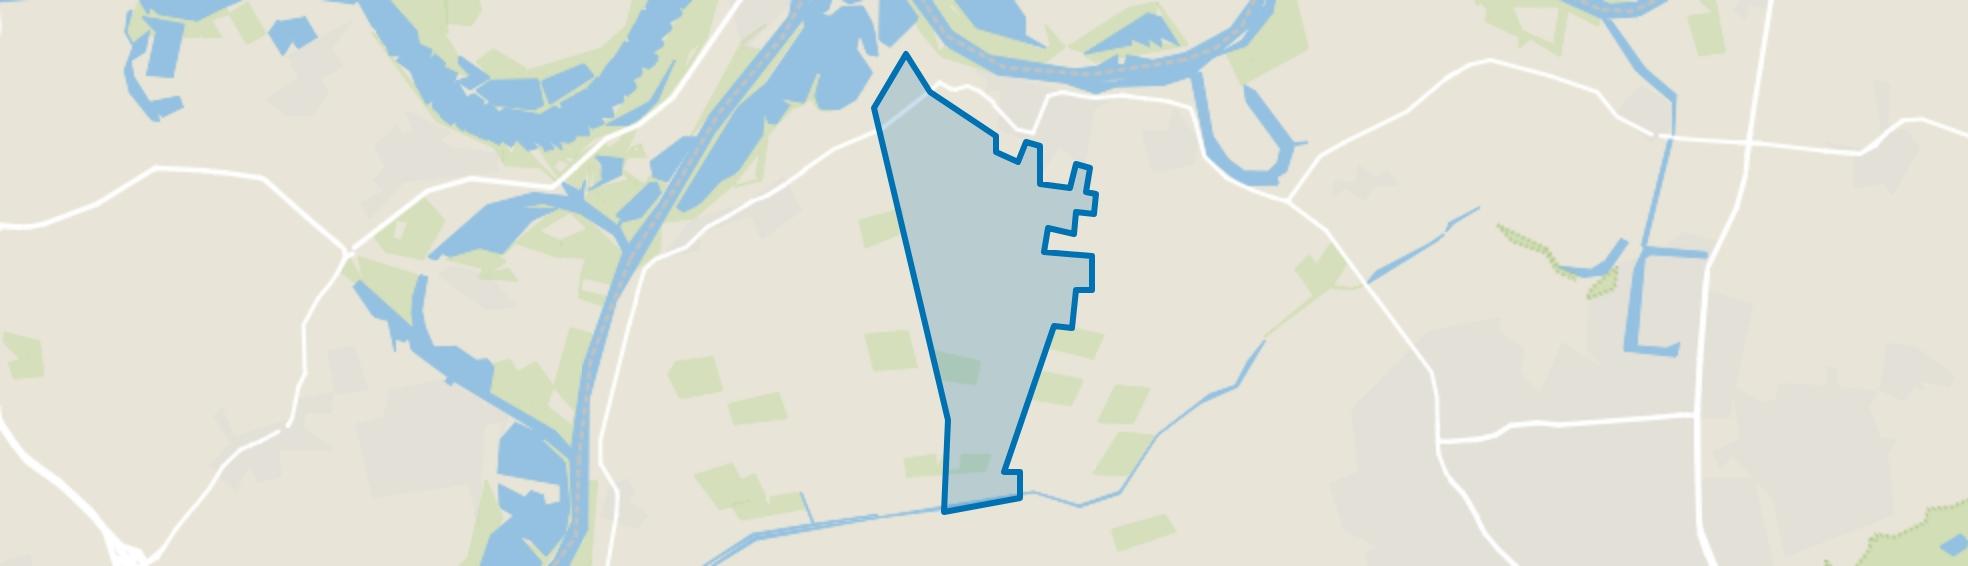 Buitengebied Lith, Lith map